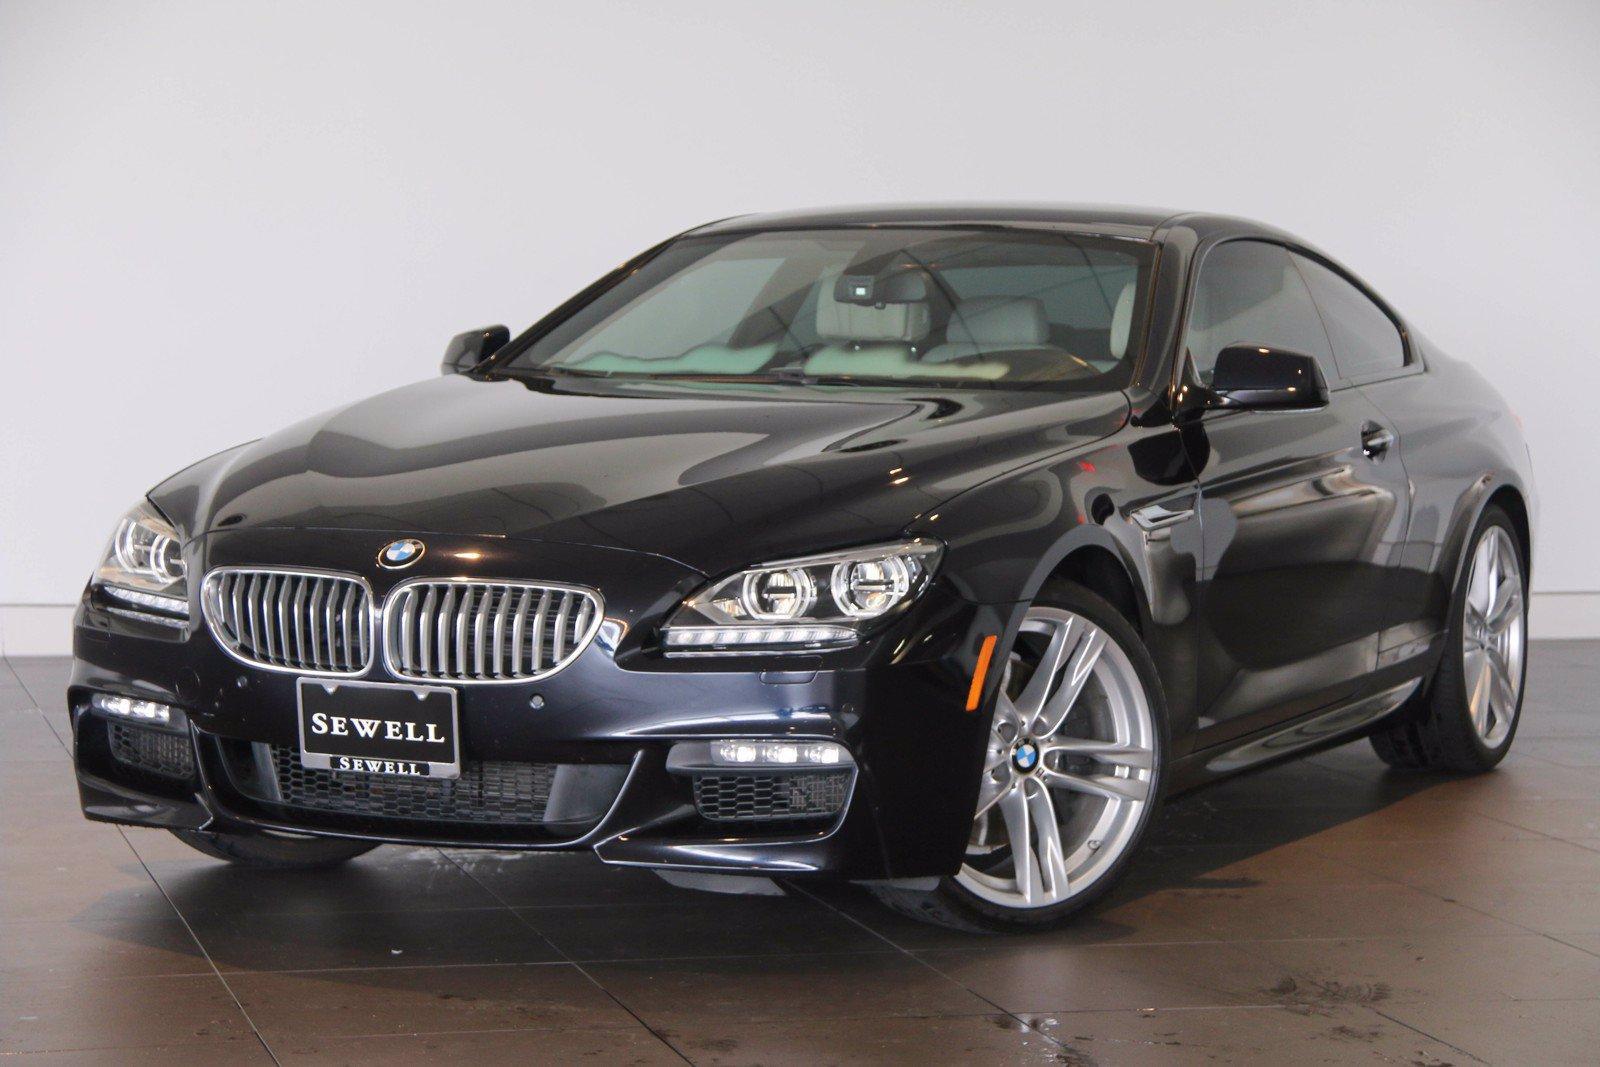 2013 BMW 650i Vehicle Photo in Sugar Land, TX 77478